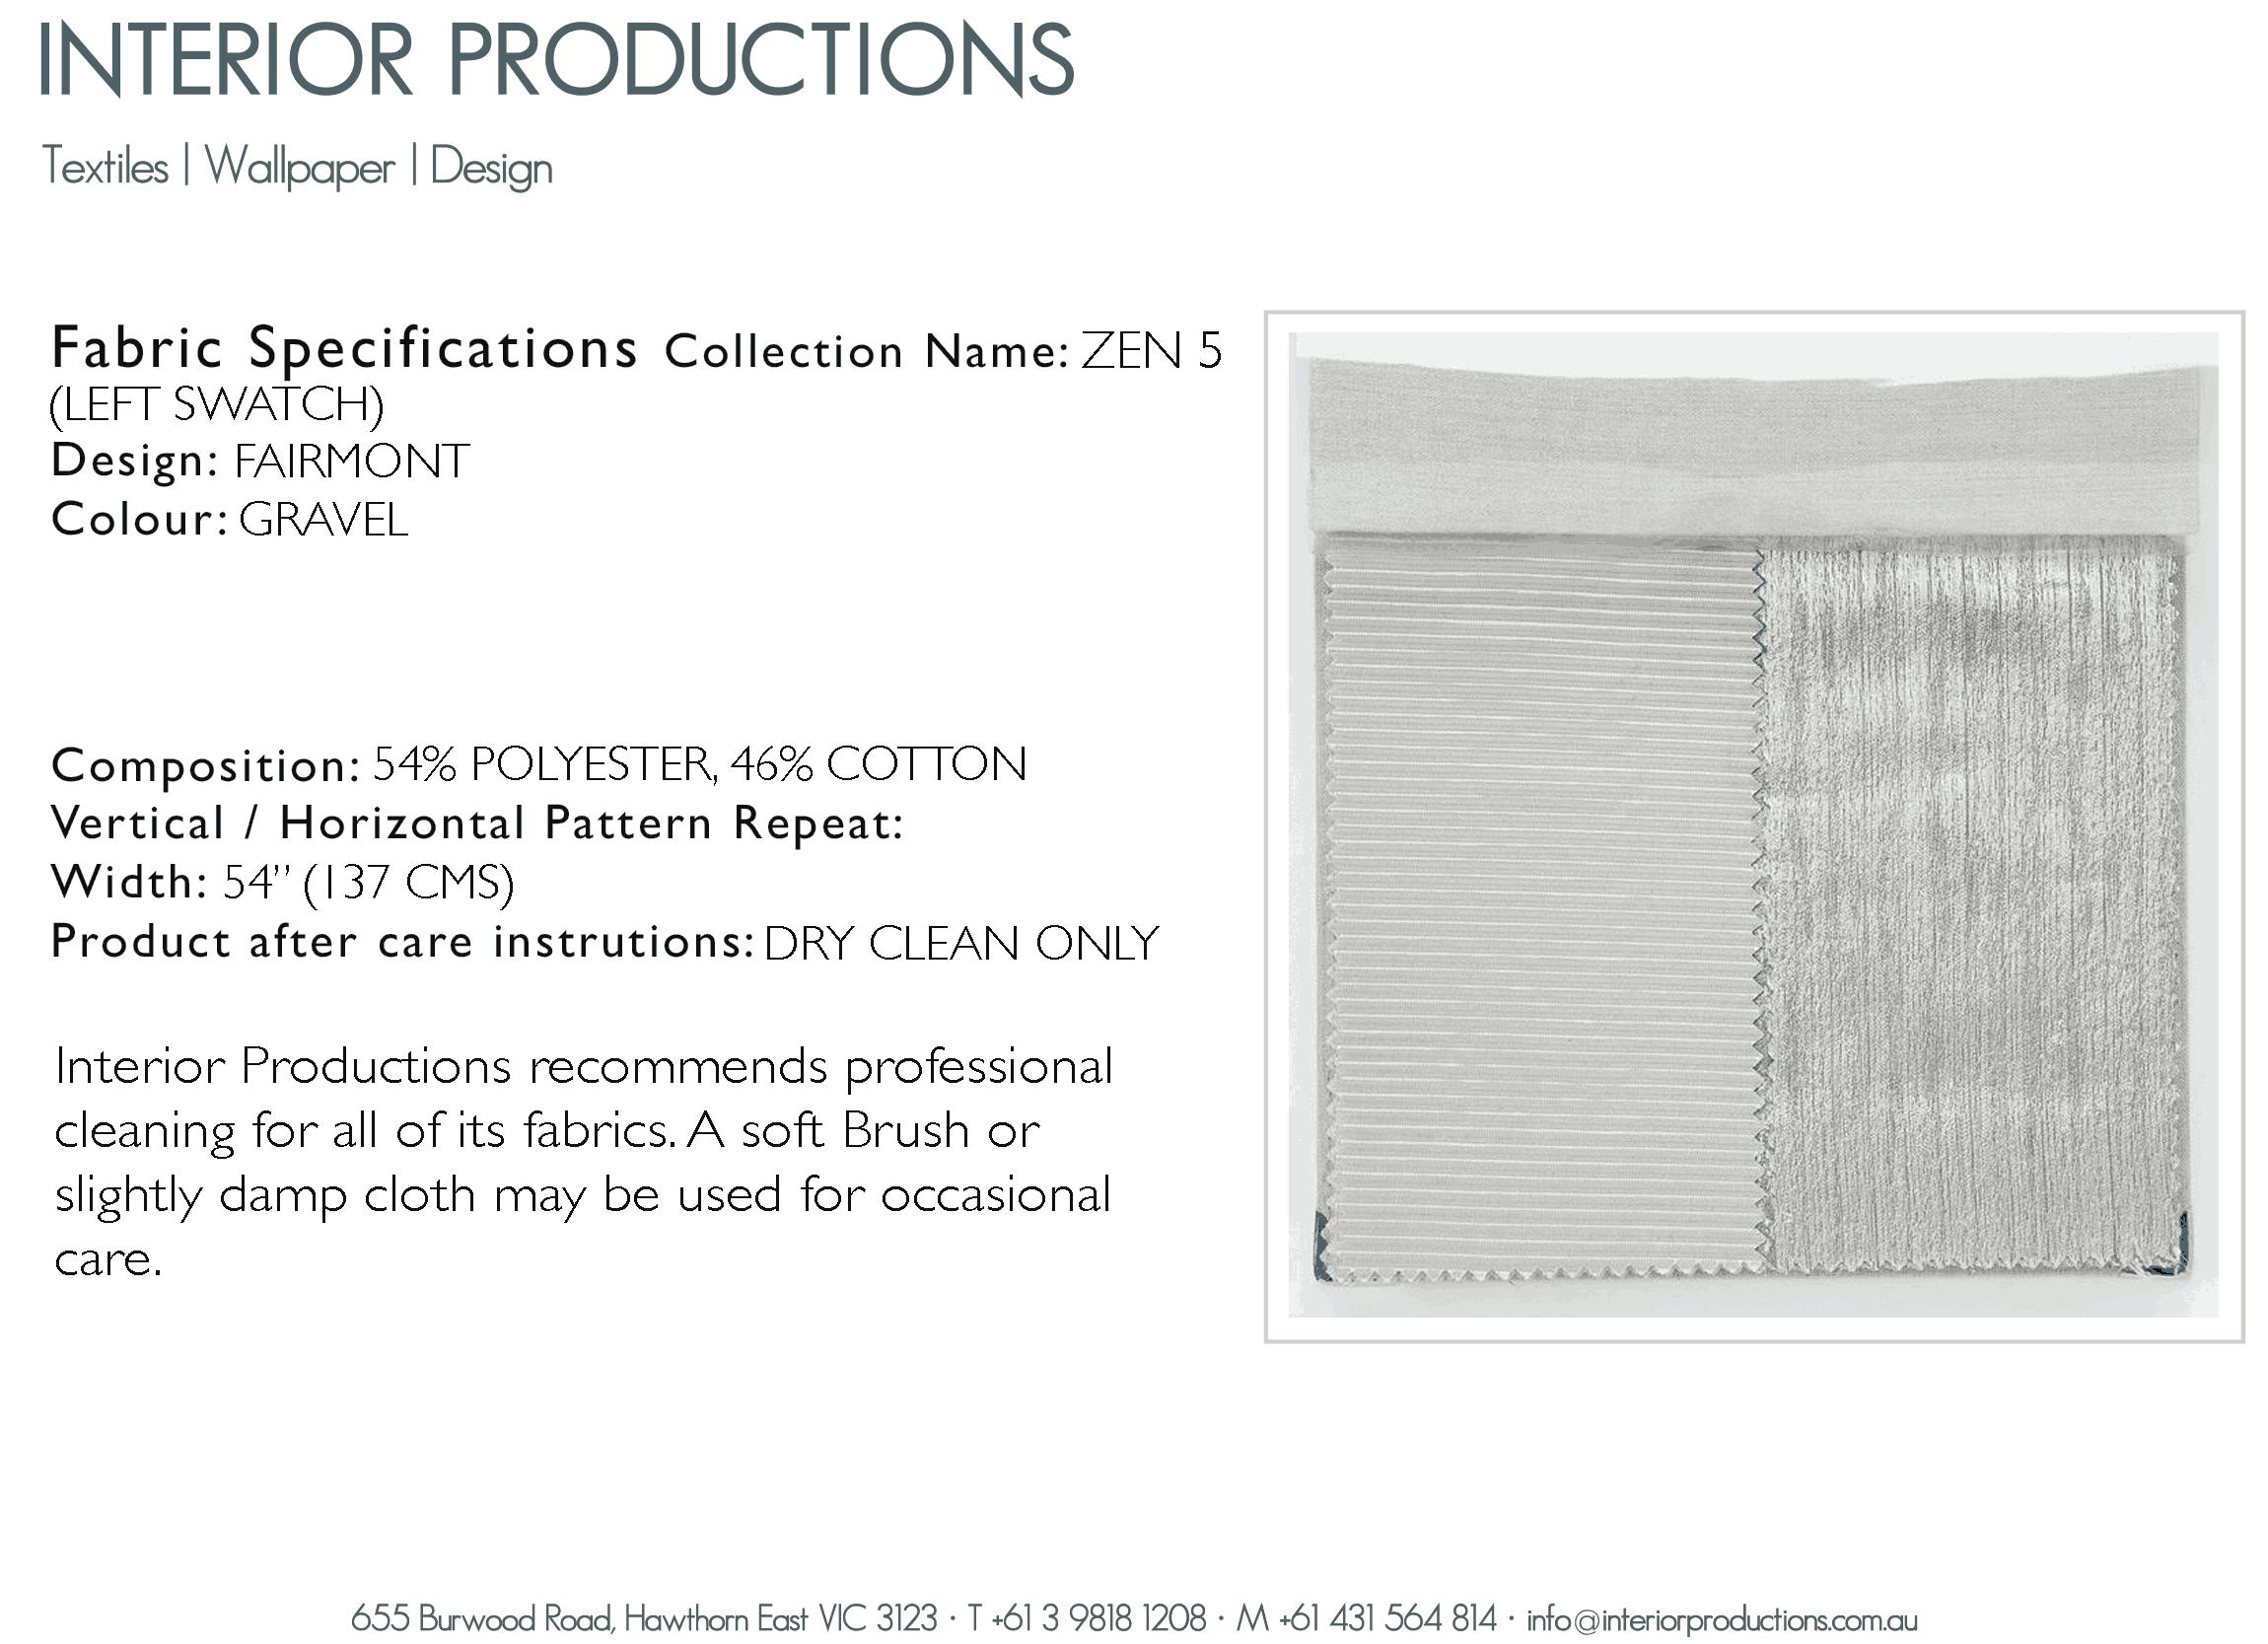 interior_productions_FAIRMONT---GRAVEL